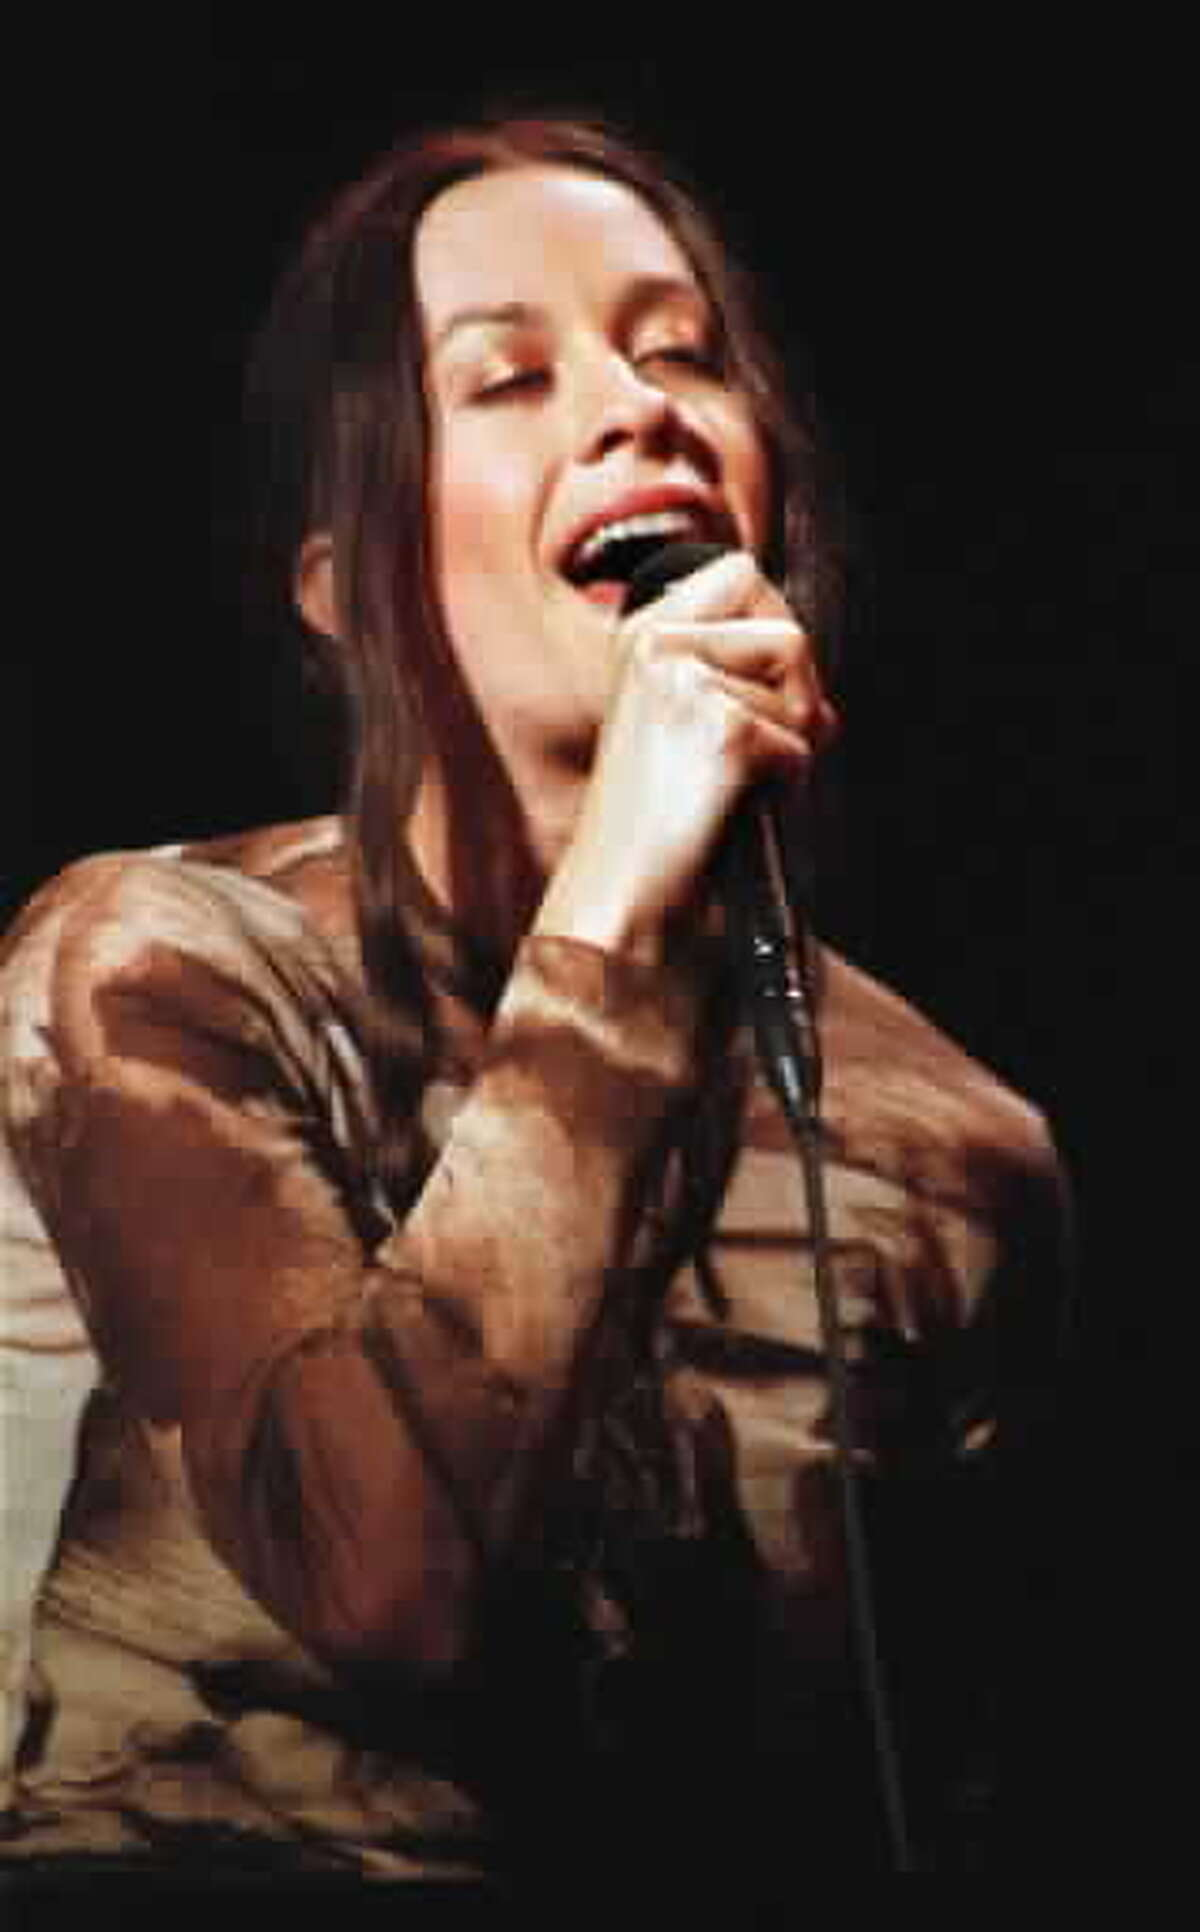 Alanis Morissette returns Sept. 5, 2021, to the Saratoga Performing Arts Center. (File photo.)